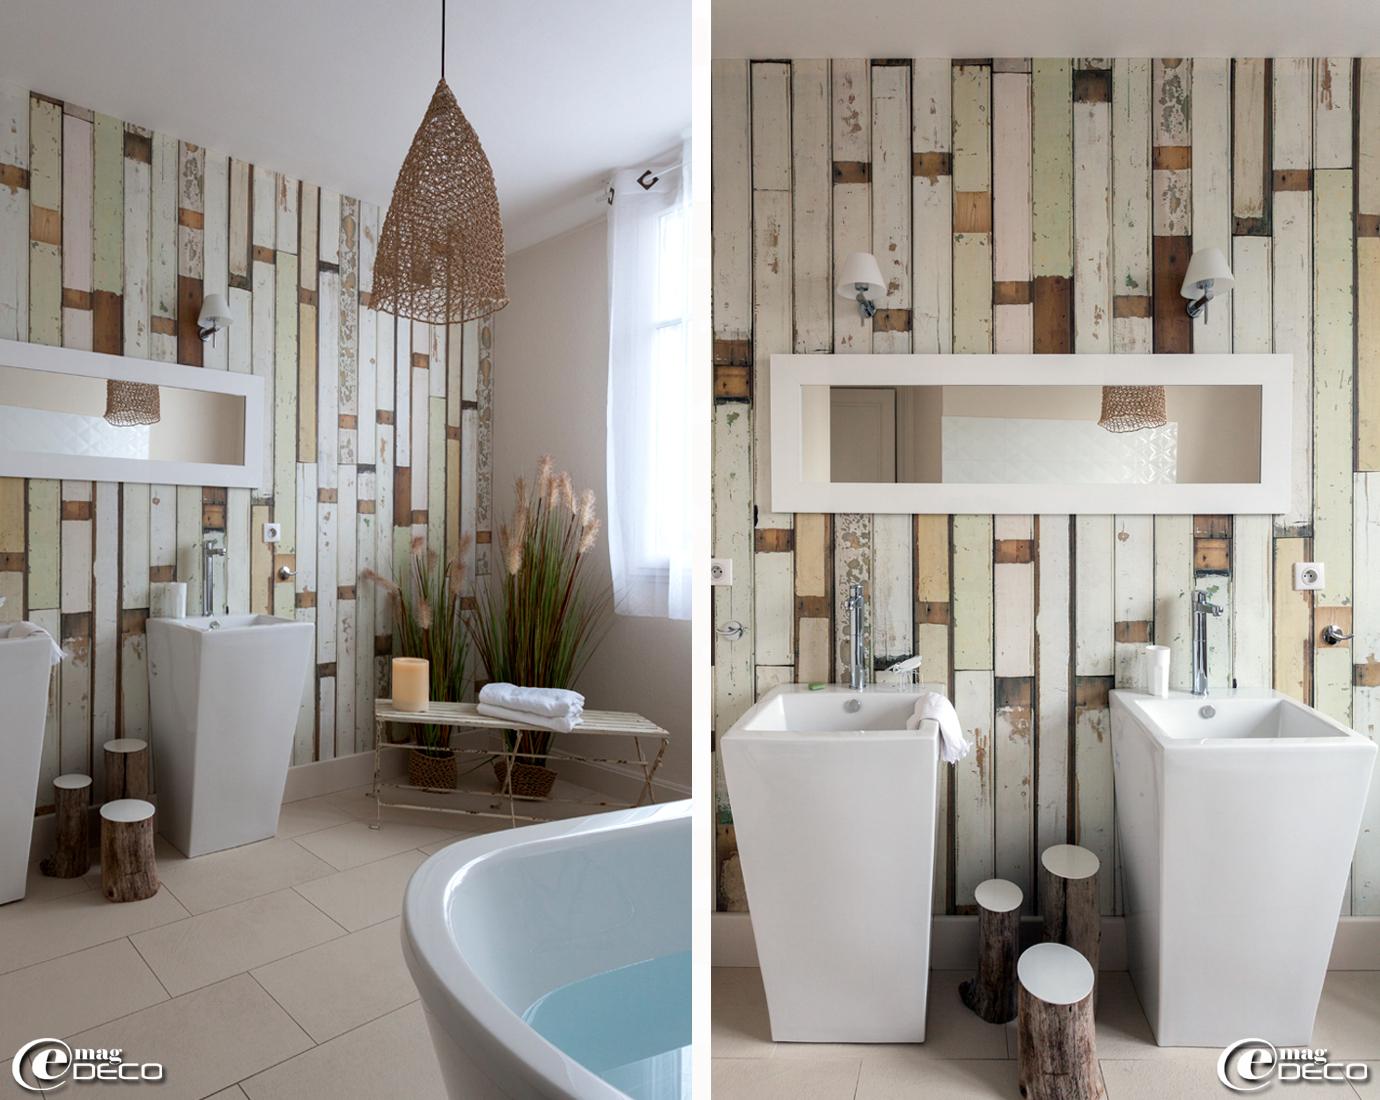 Glace salle de bain castorama for Applique salle de bain castorama